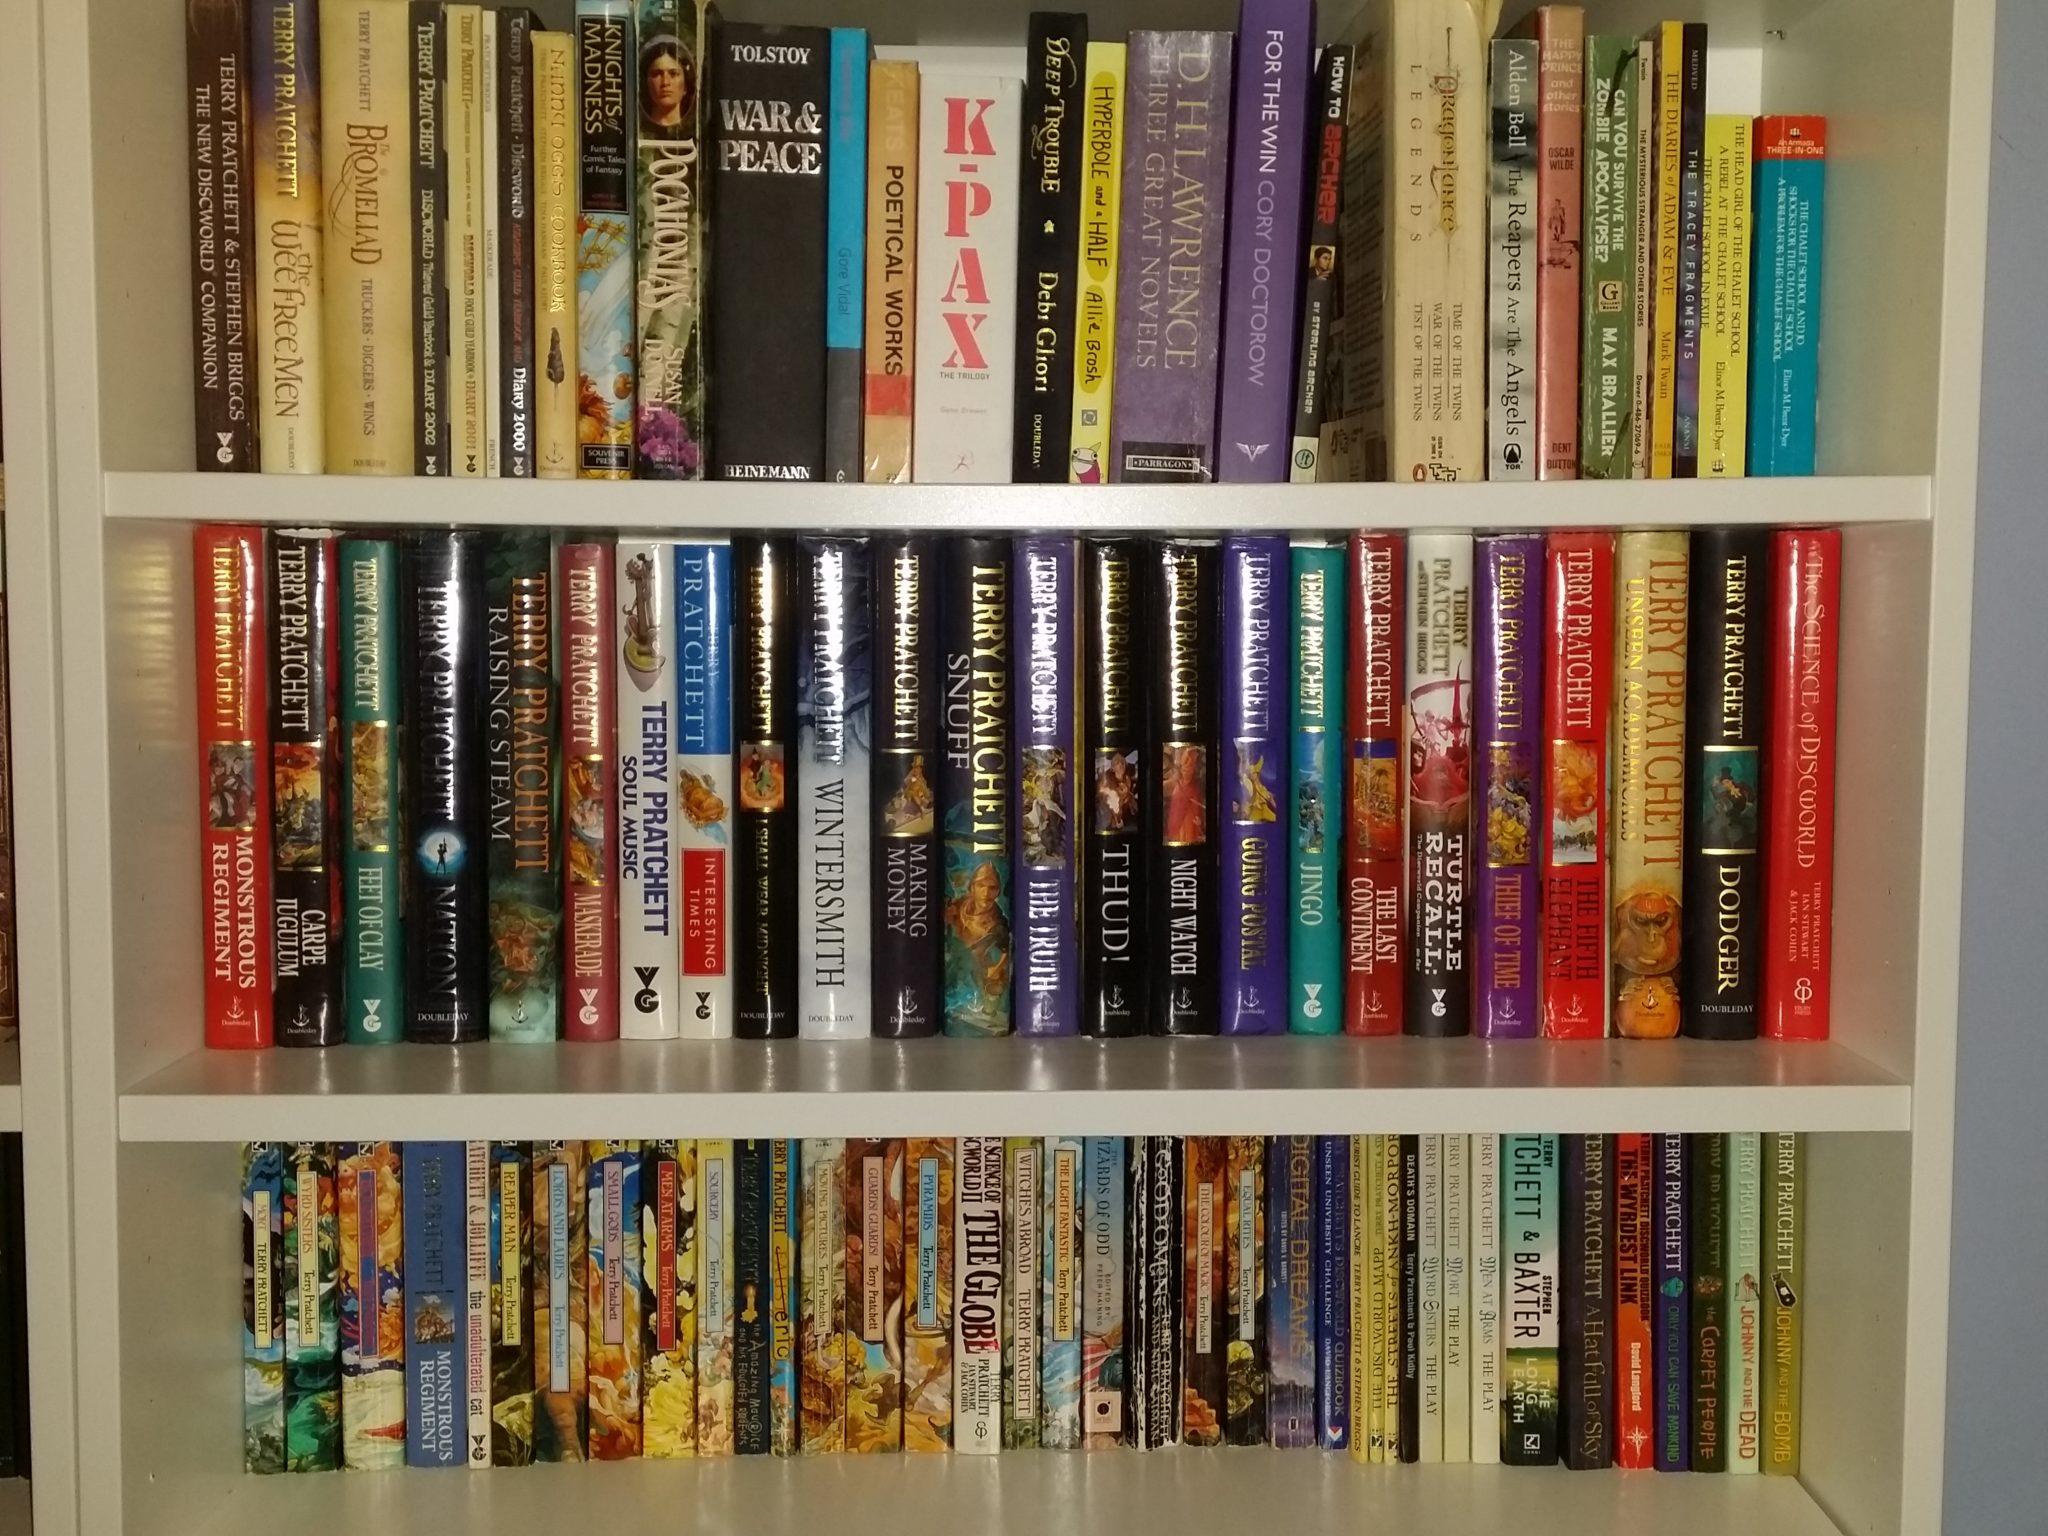 A Depth Year of Terry Pratchett books